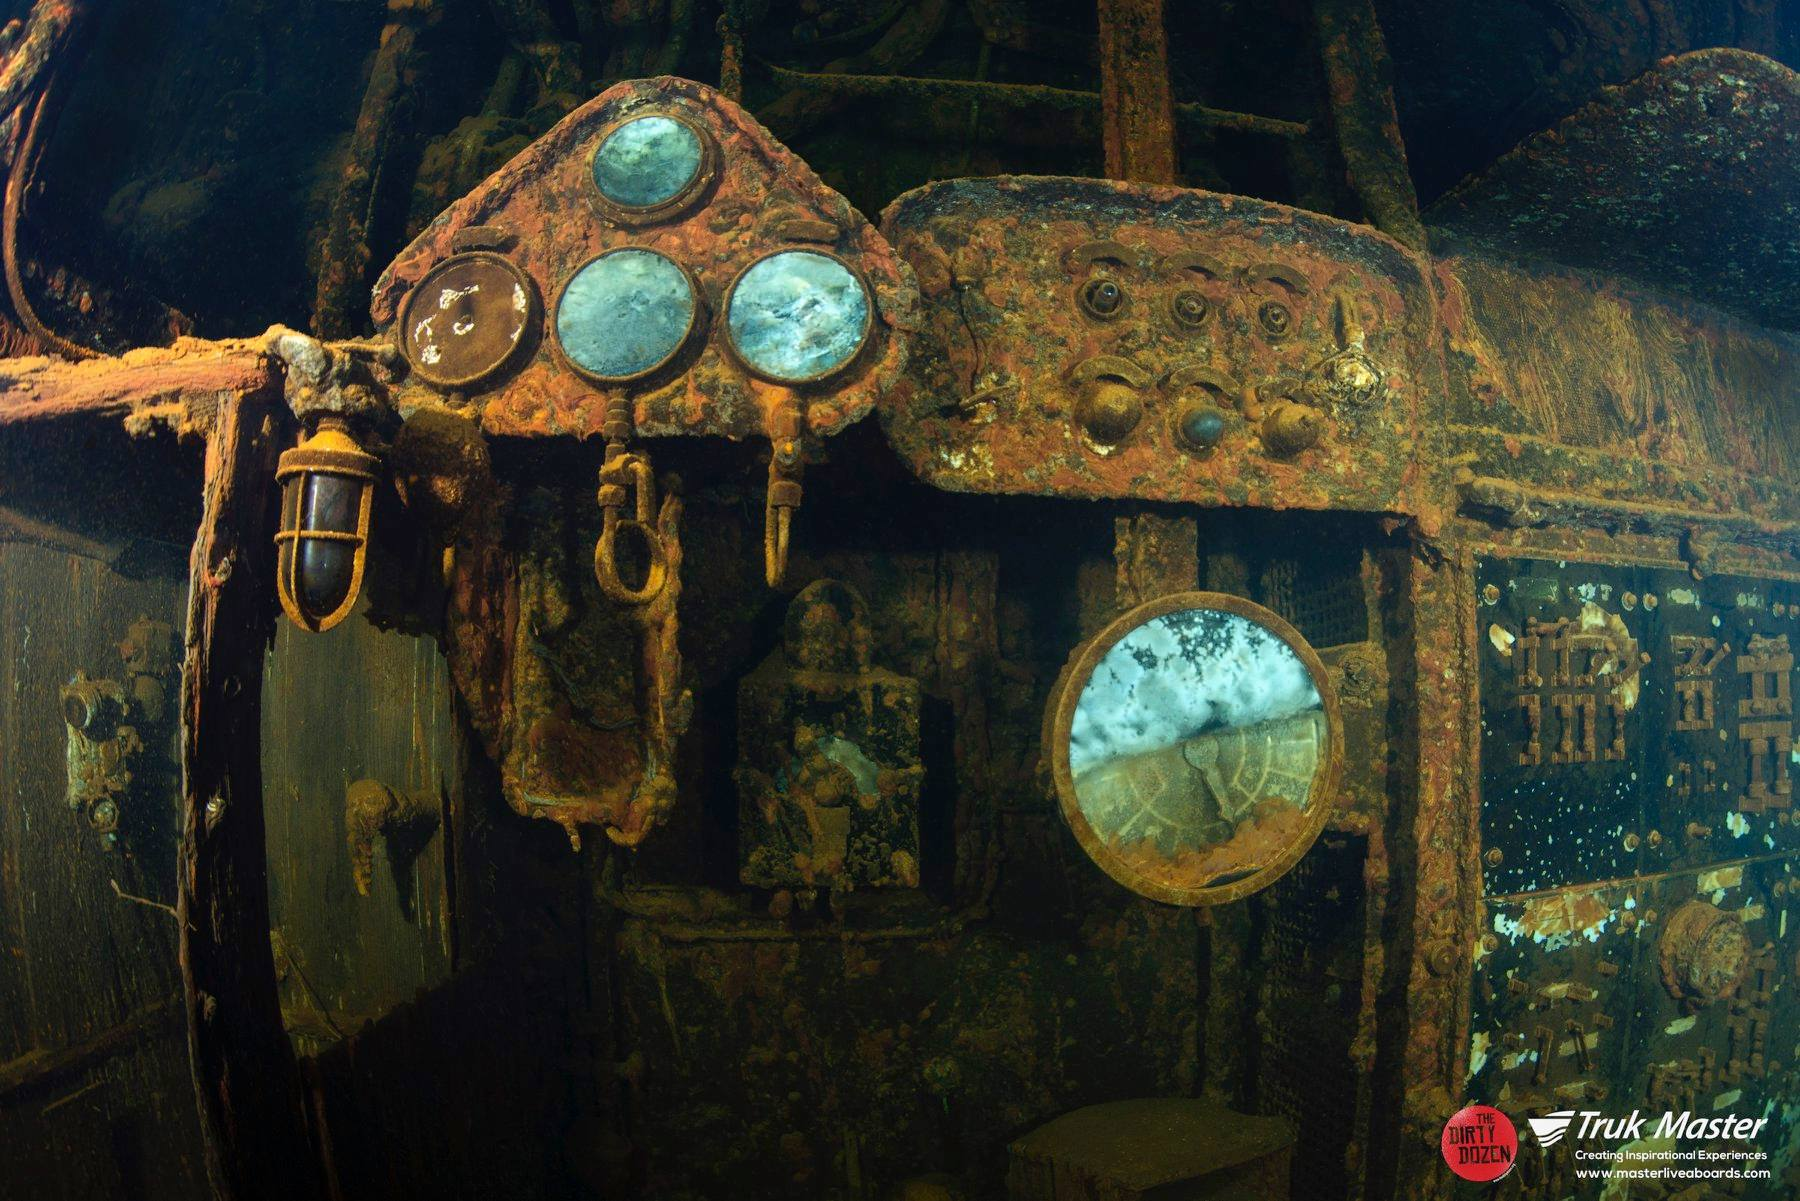 47Fujikawa Maru Engine Room.jpg